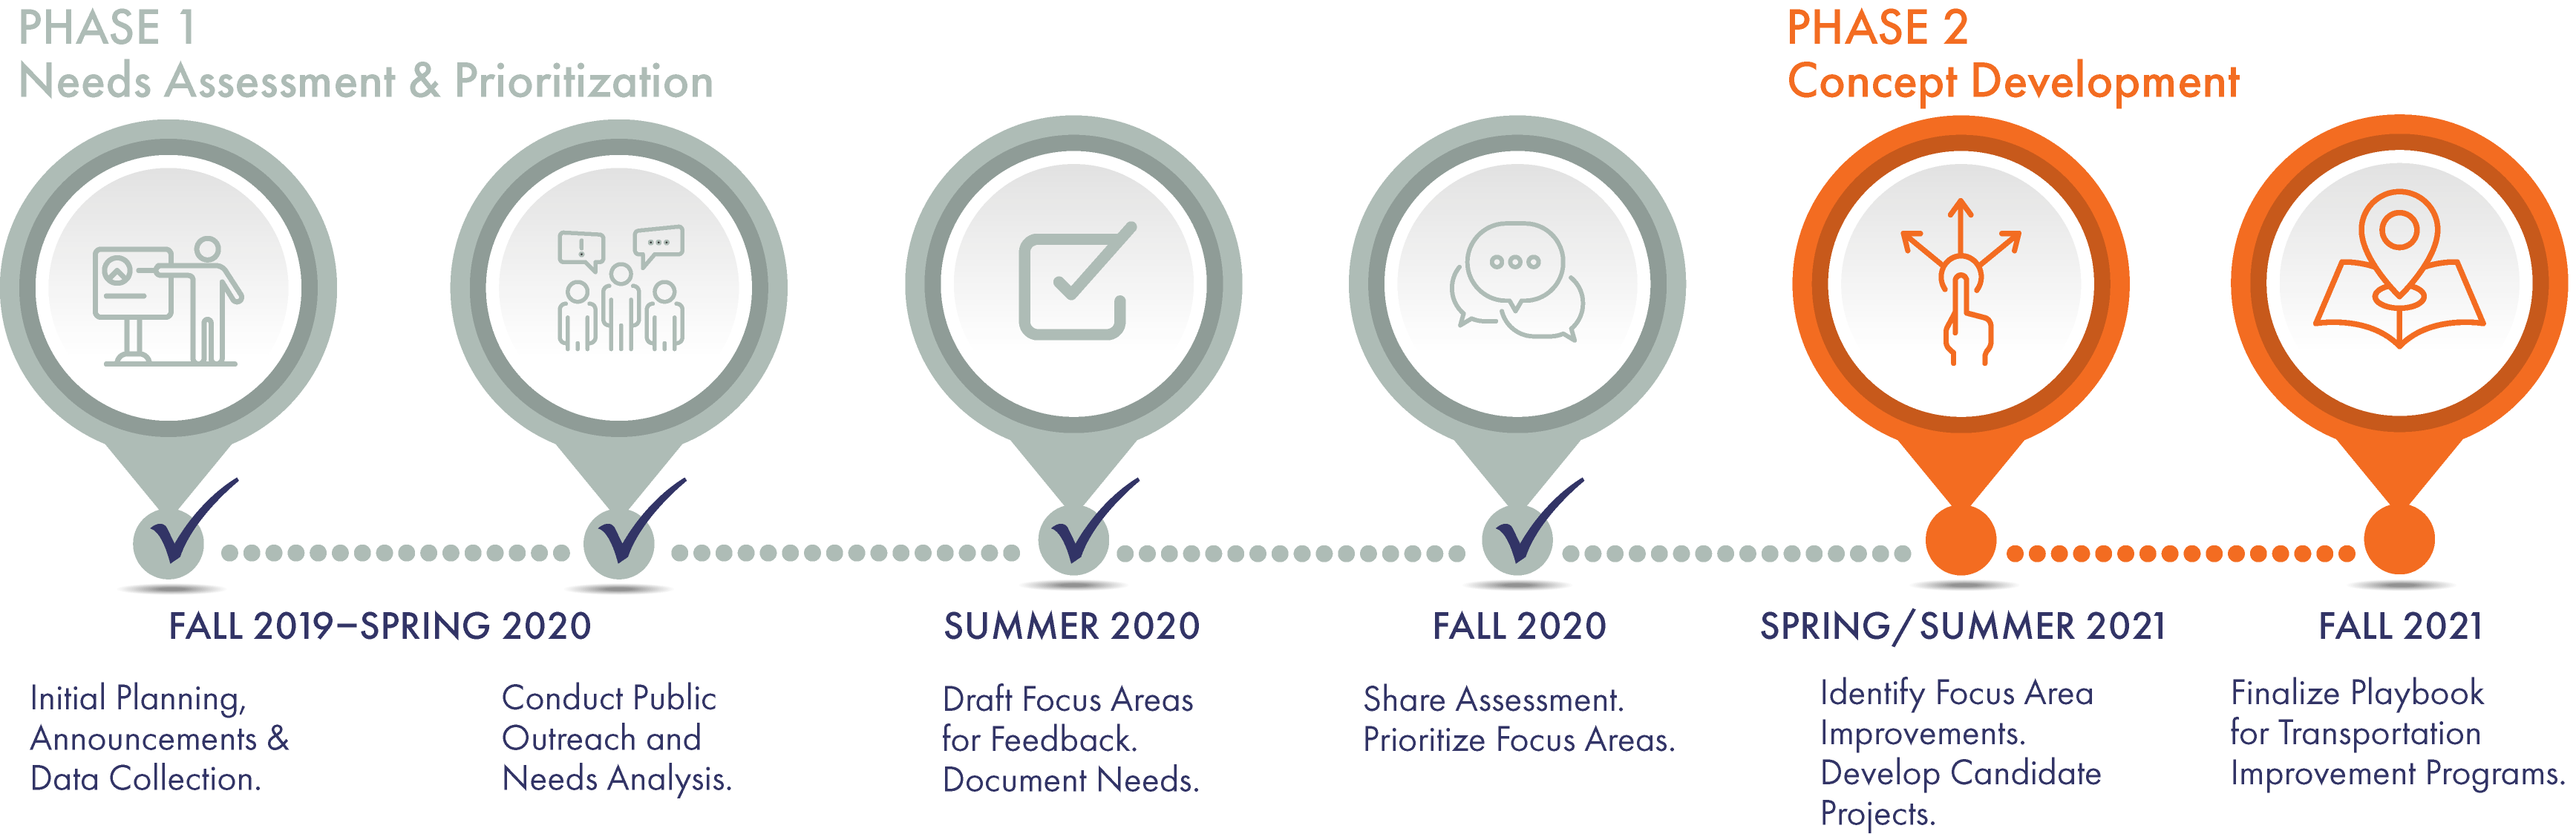 I-81 Schedule September 2020